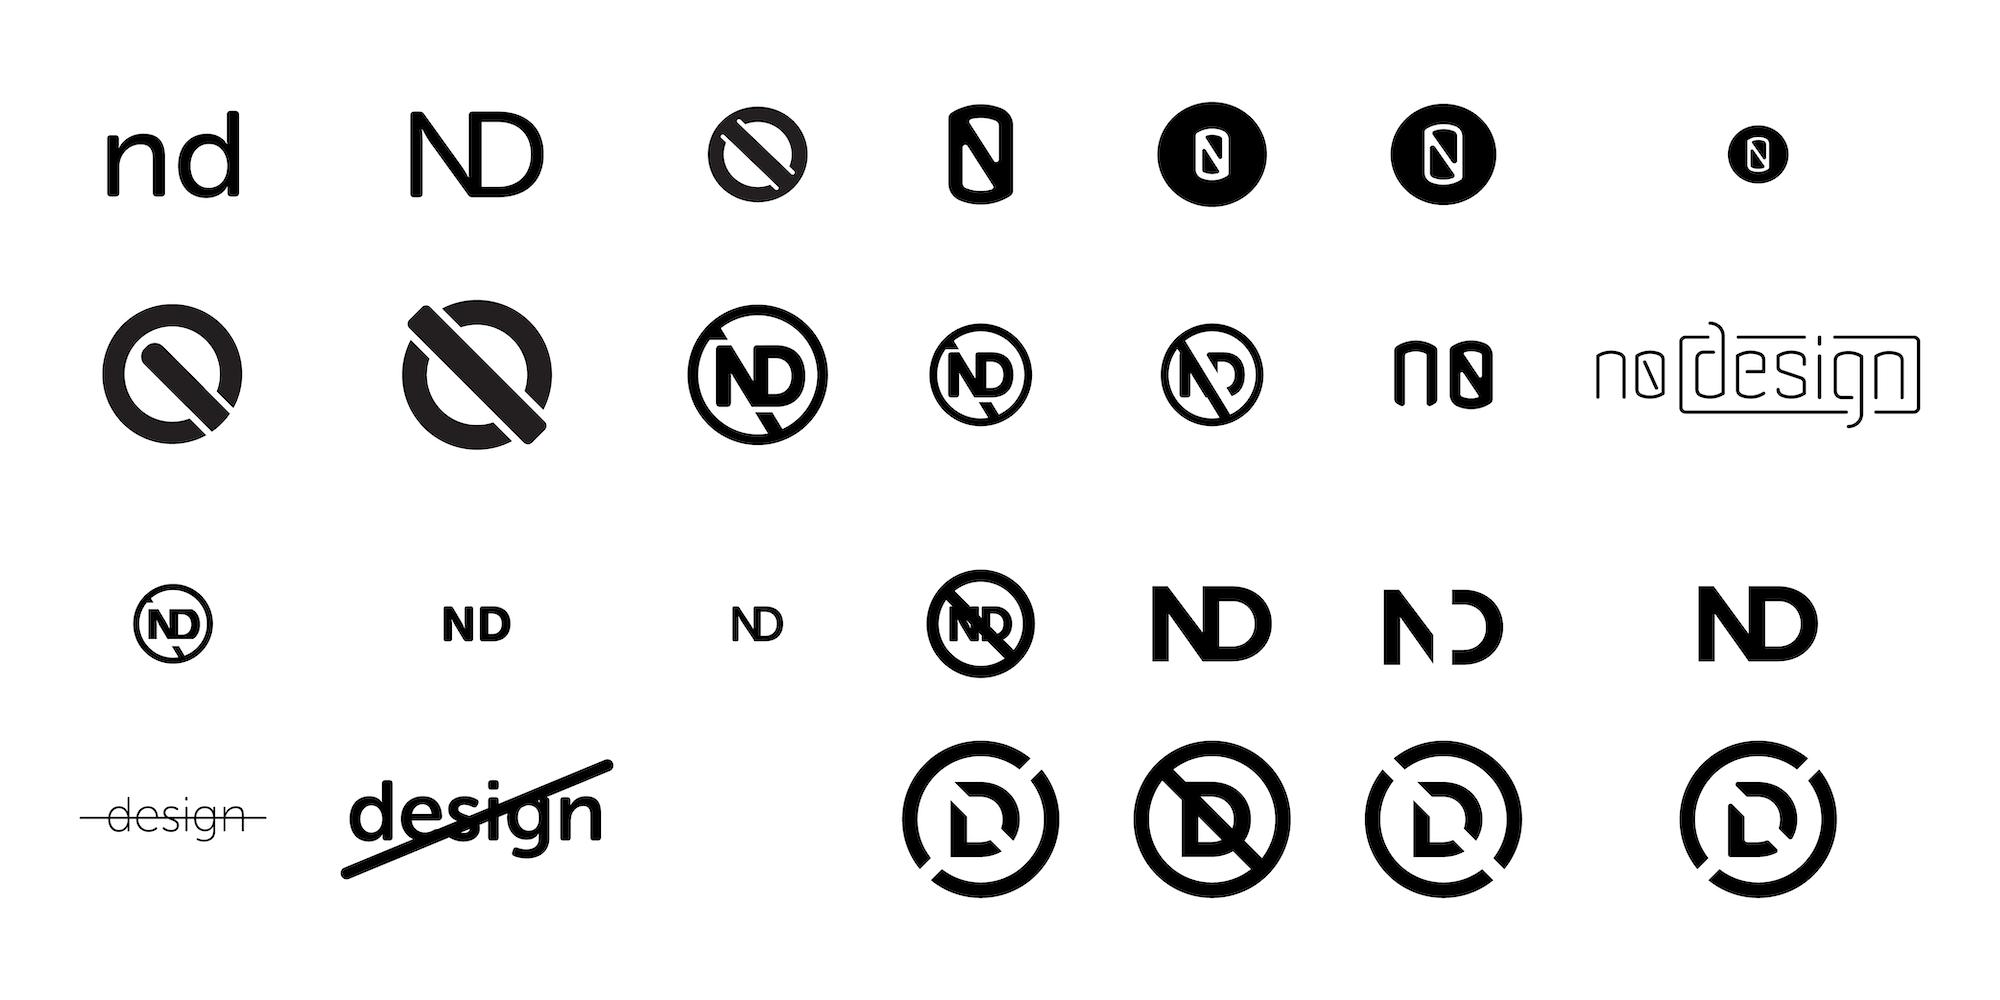 Initial designs for 'No Design' logo and wordmark